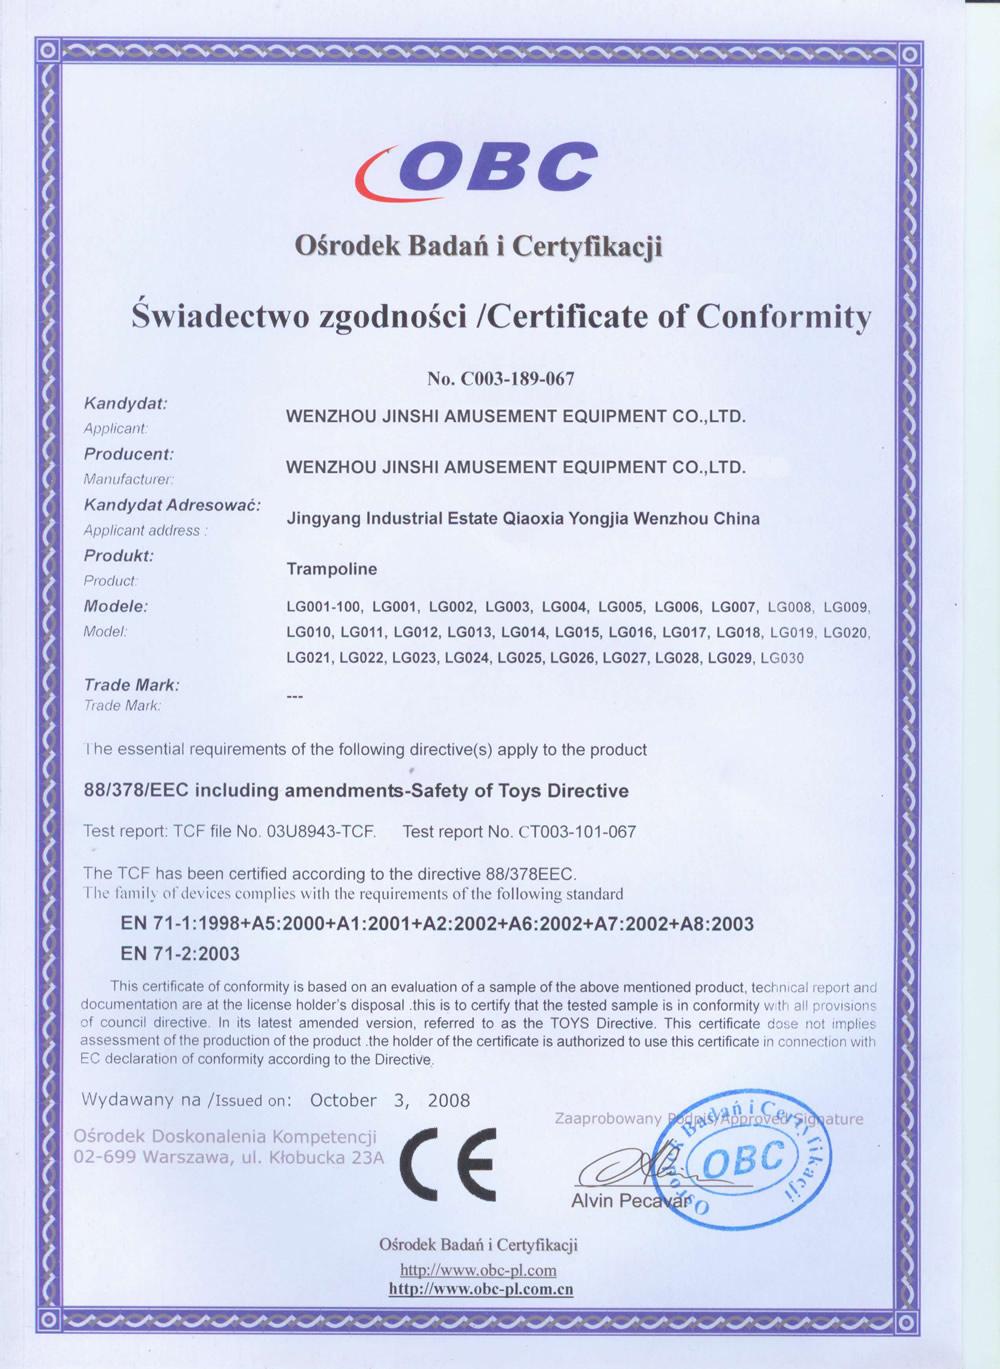 Trampoline CE certificate